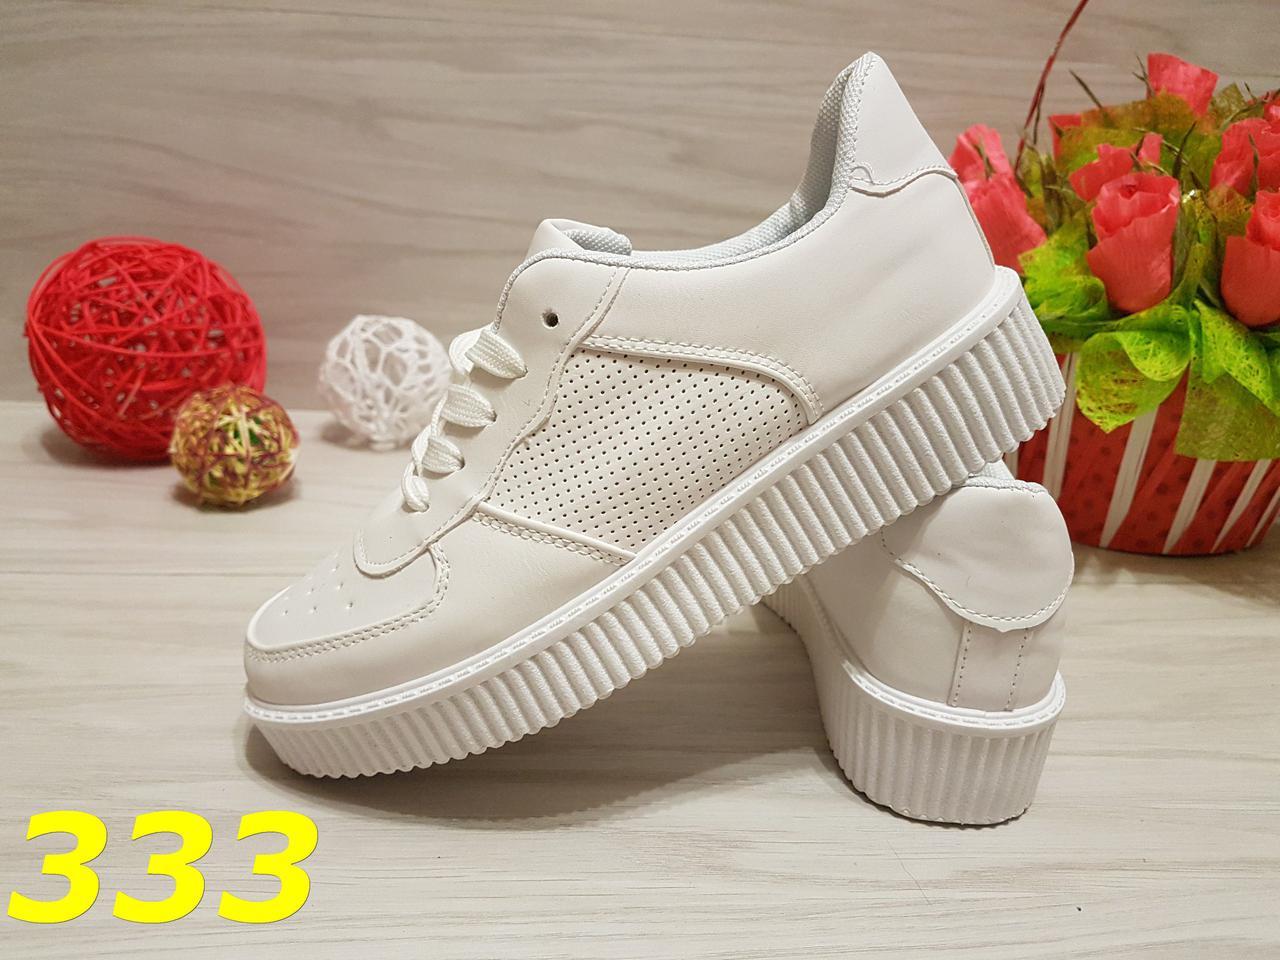 Кроссовки белые на рифленой платформе 659e8eef975a0